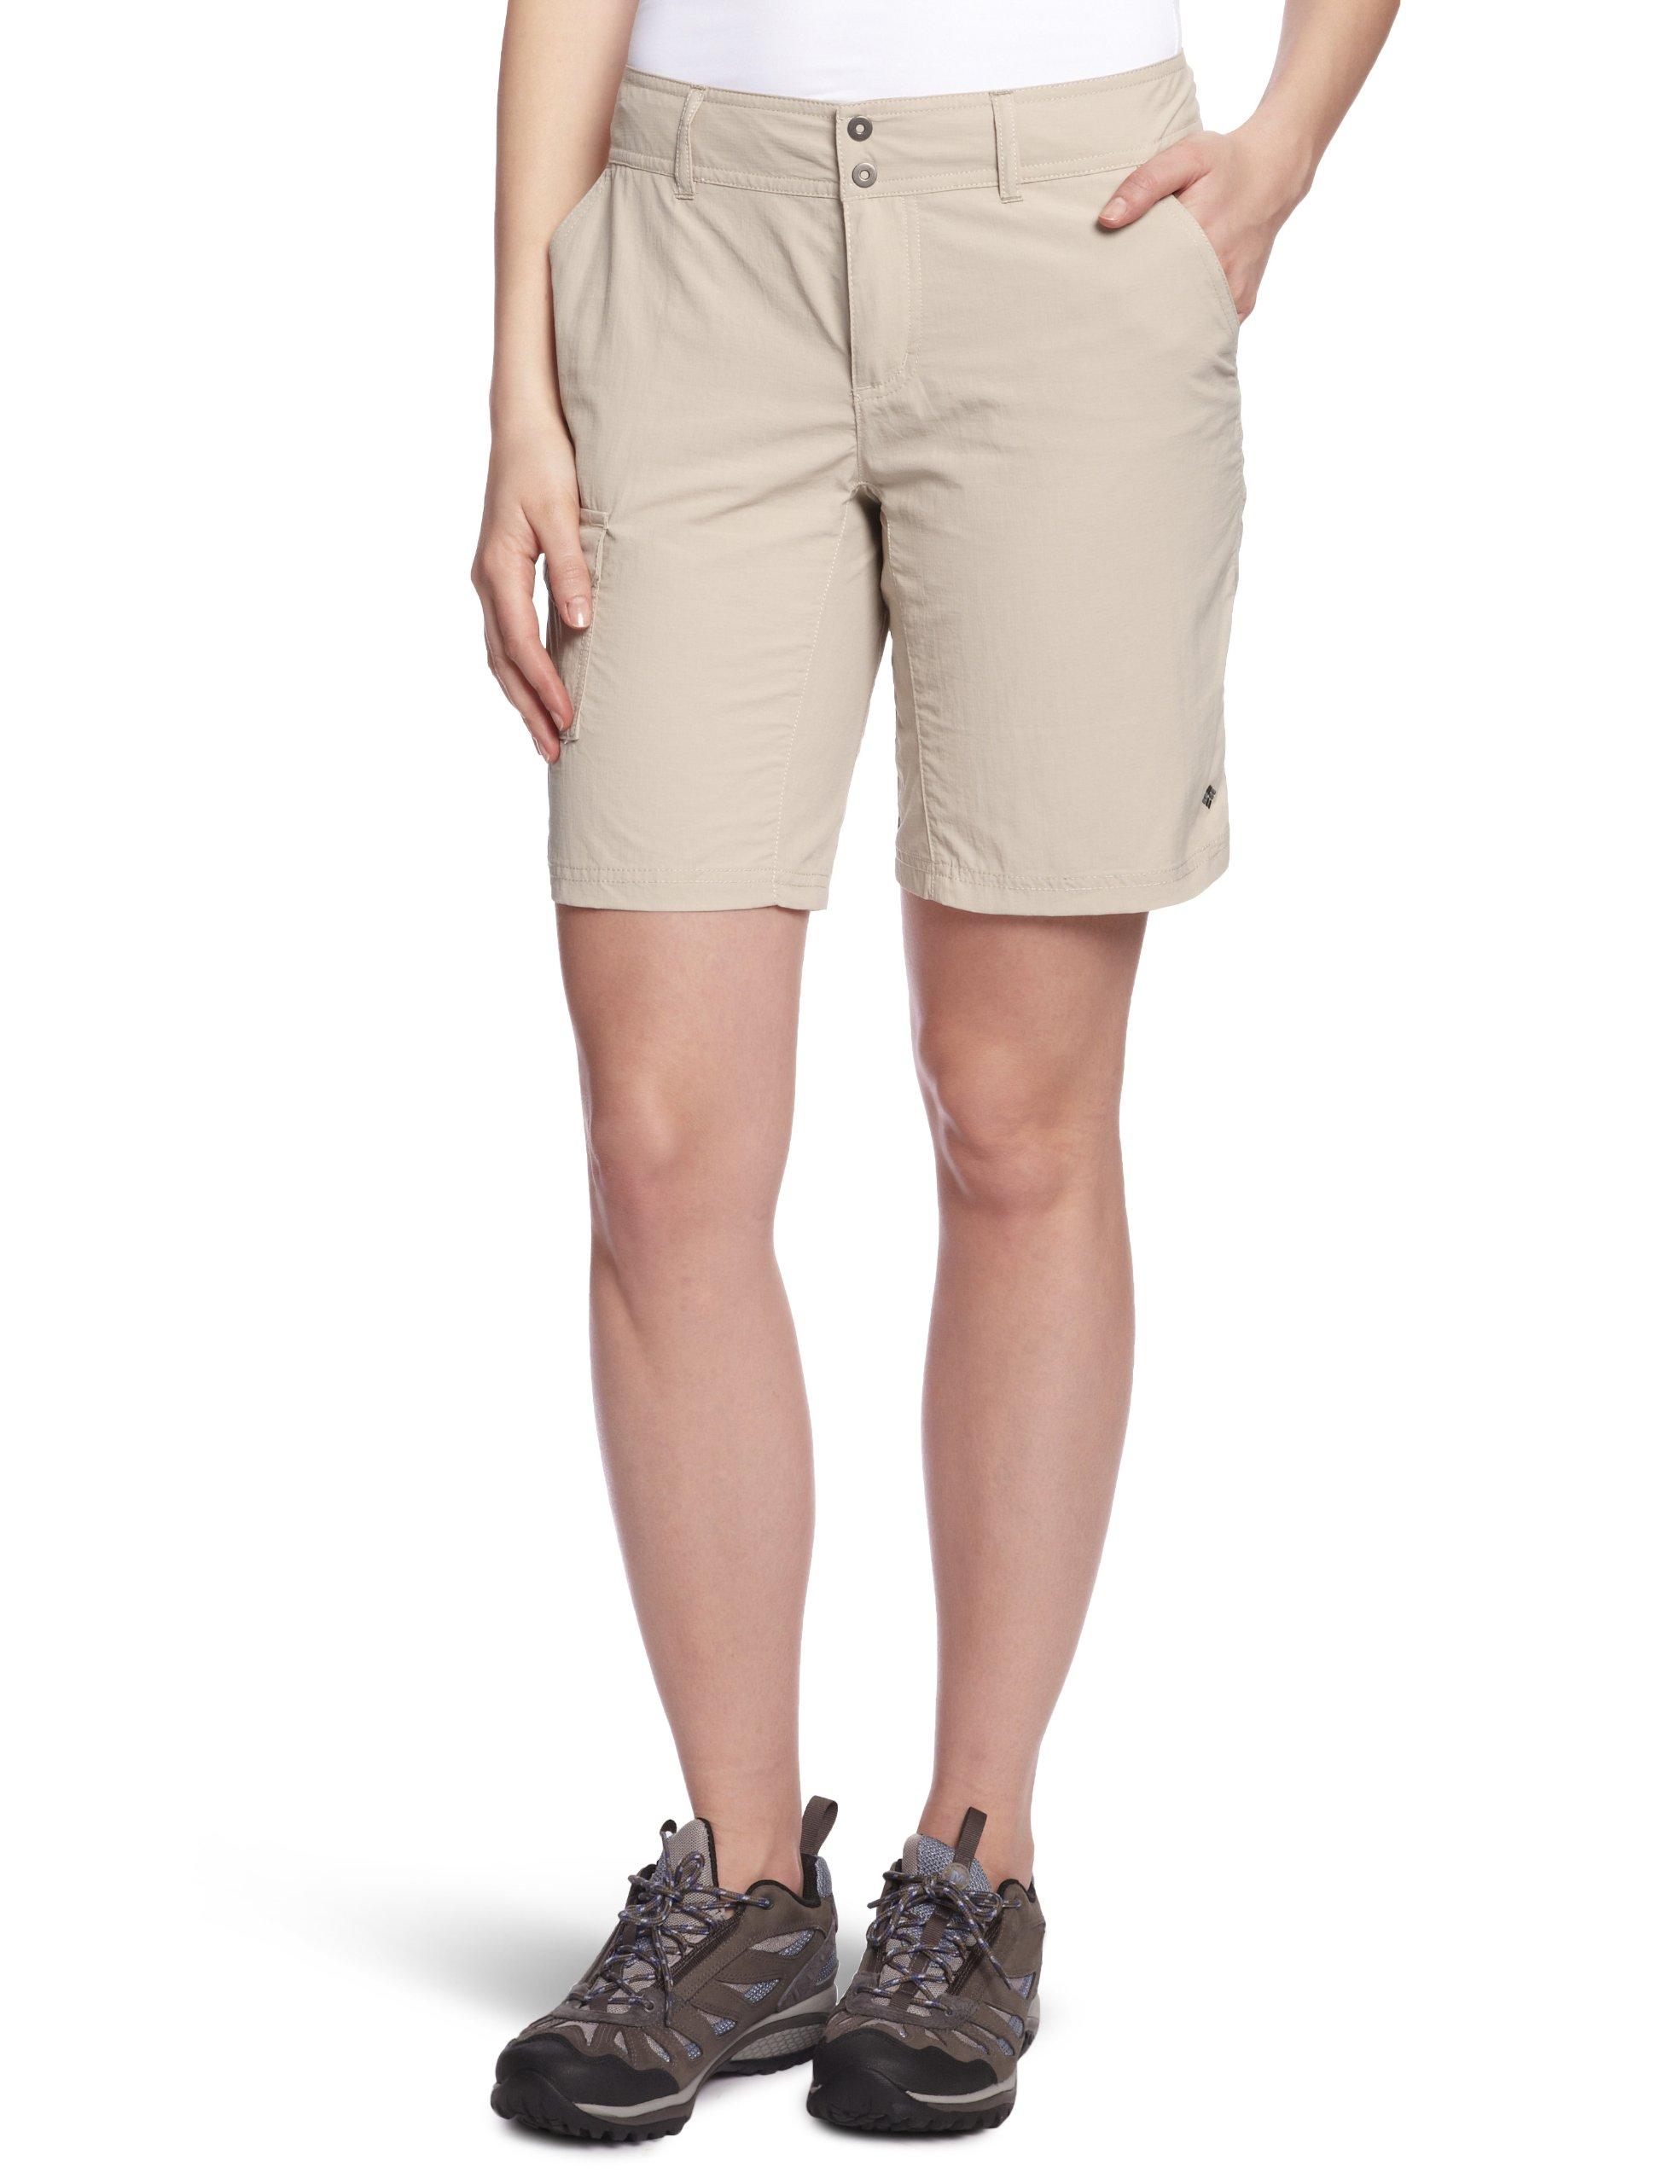 Columbia Women's Silver Ridge Short, 8x9, Fossil